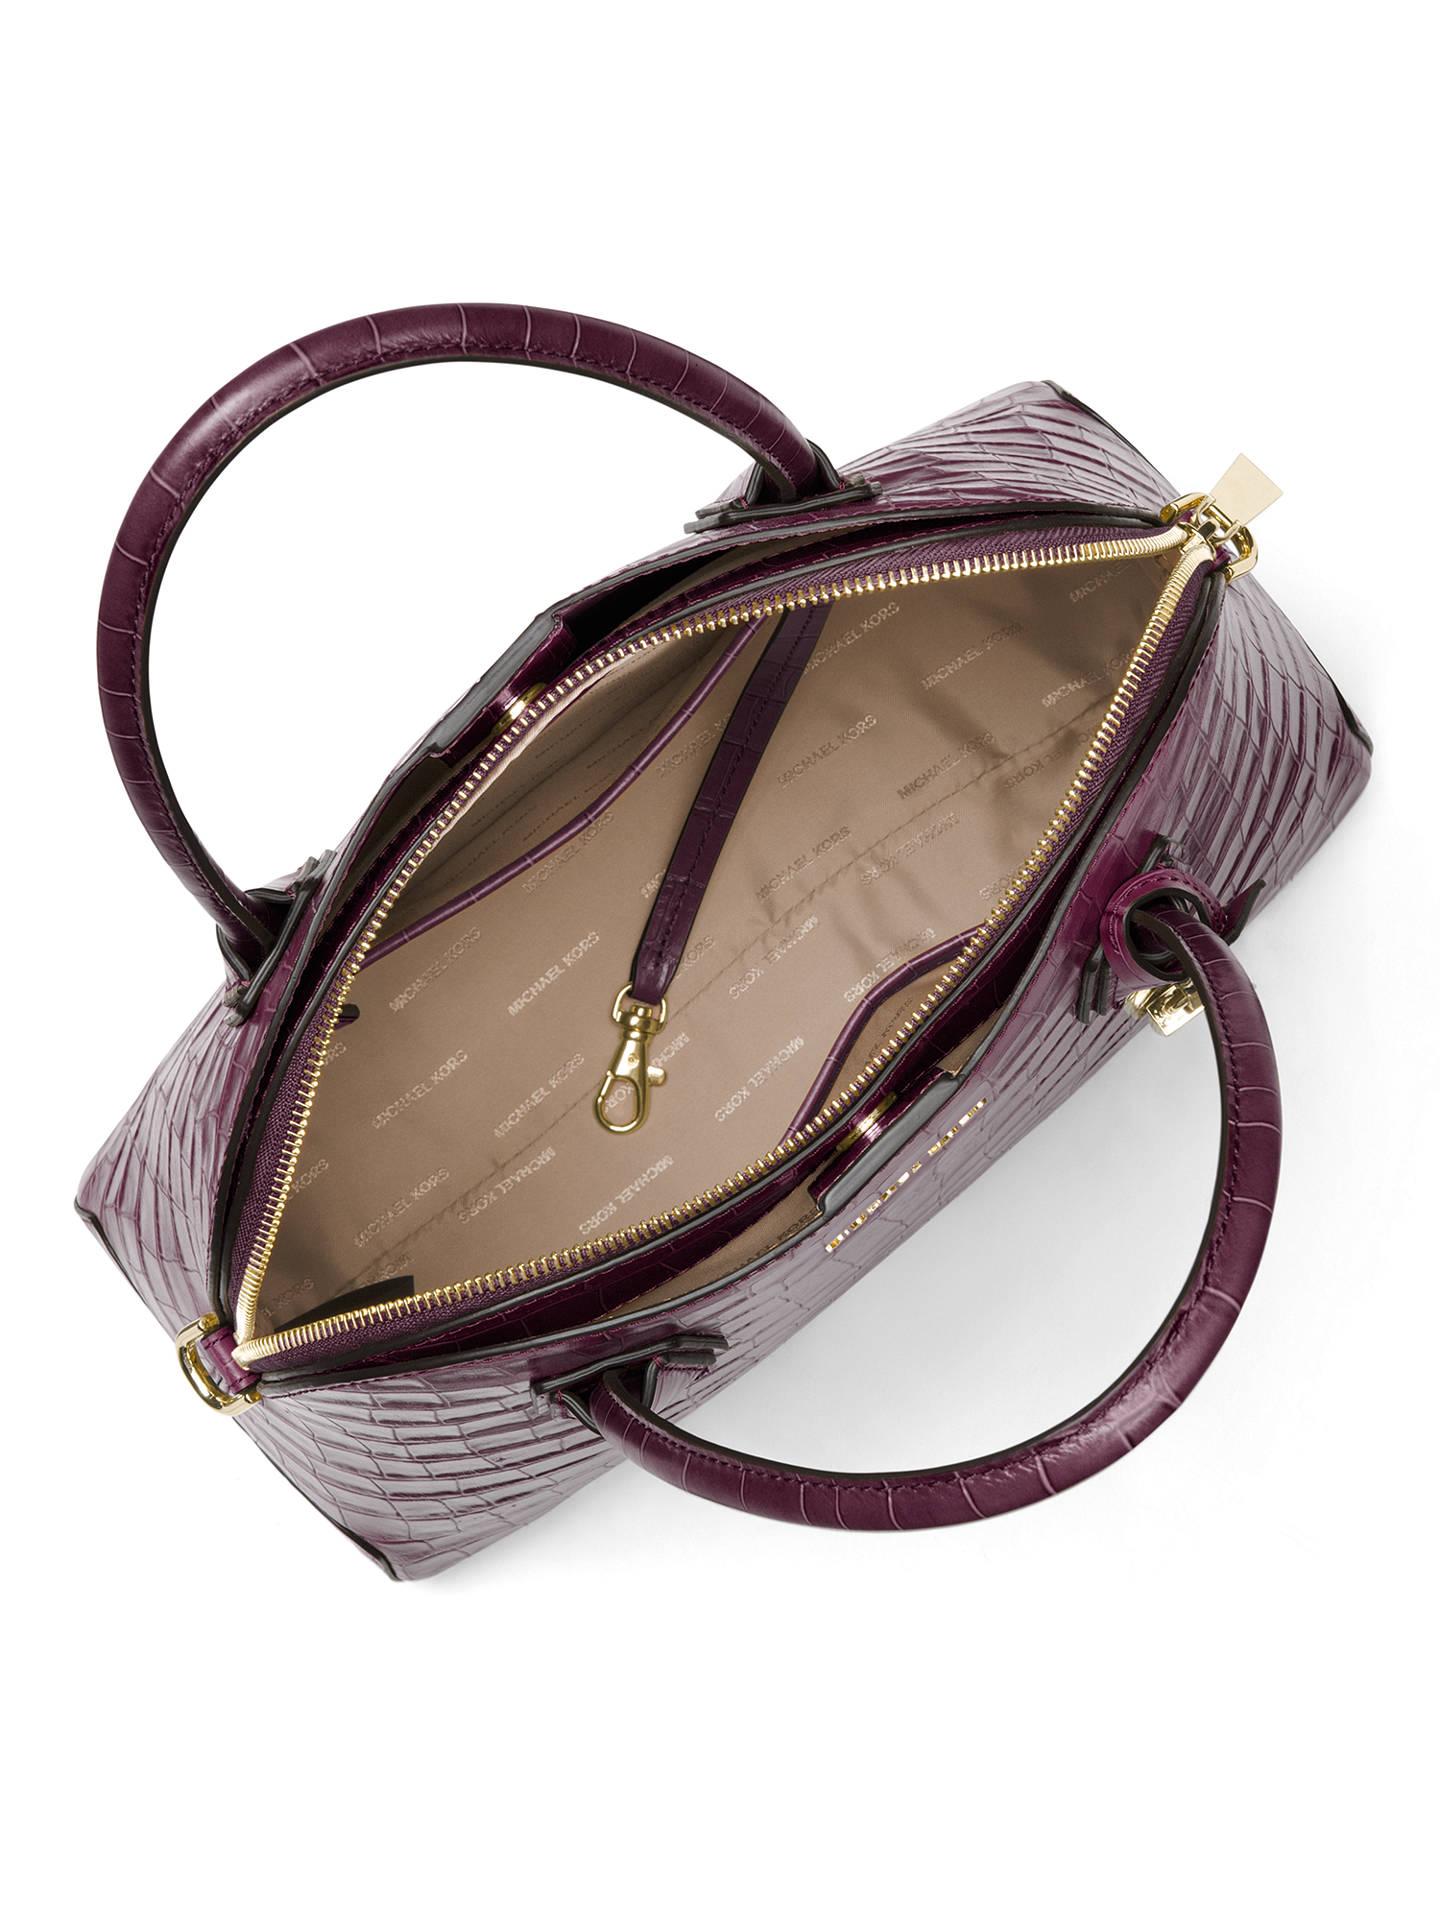 08e053ed1117 Buy MICHAEL Michael Kors Mercer Large Leather Dome Satchel Bag, Damson  Online at johnlewis.